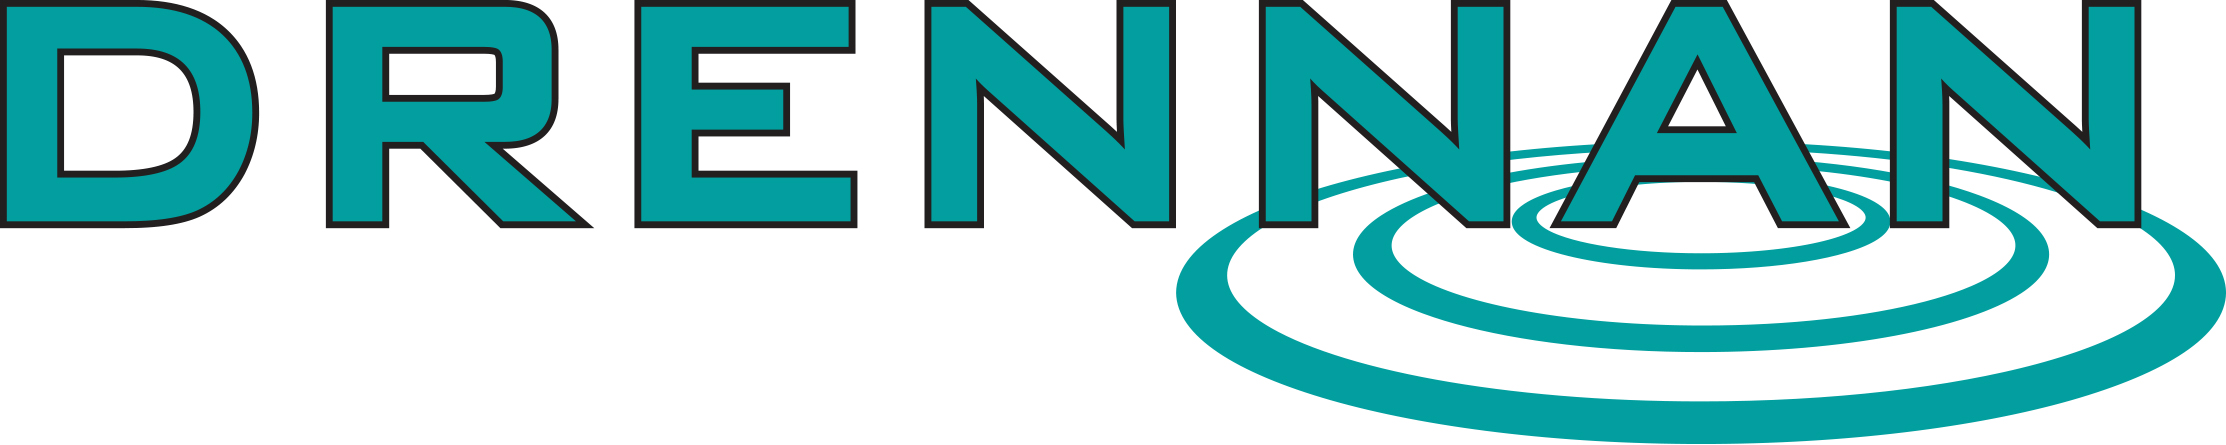 Drennan Carbon Feeder Micro Barbed Hooks To Nylon